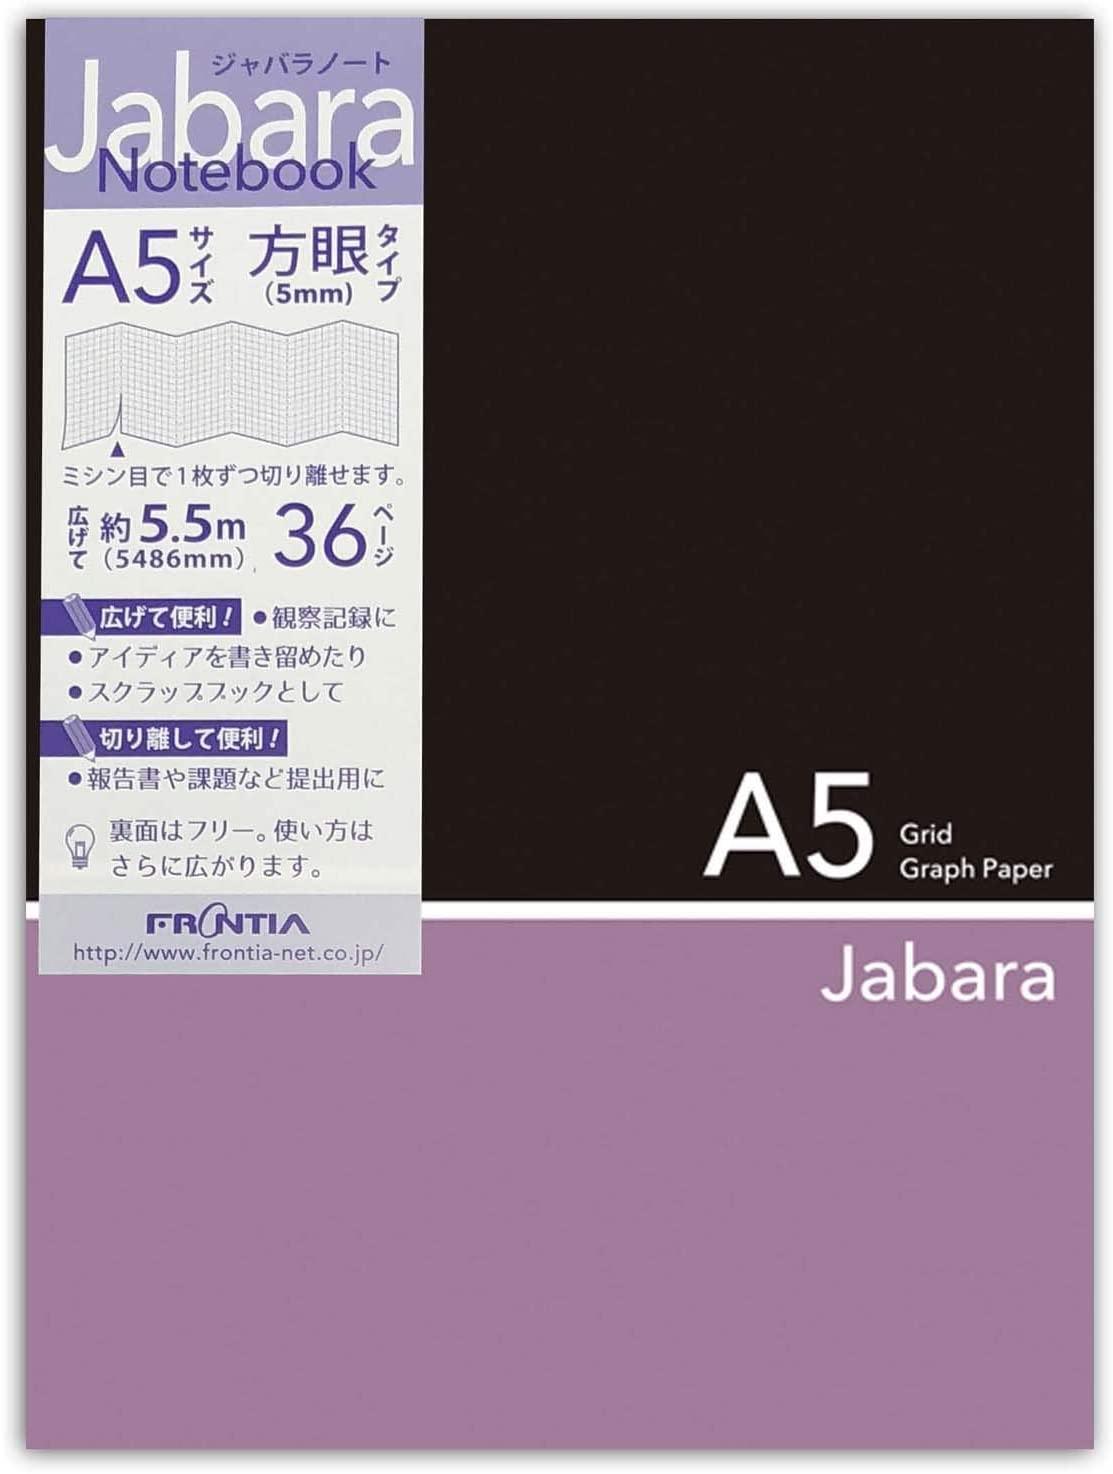 Frontia Jabara Folding Accordion Notebooks Modern Design Mininal Simple Purple 5mm 36 Sheets Grid A5 Size 5.83